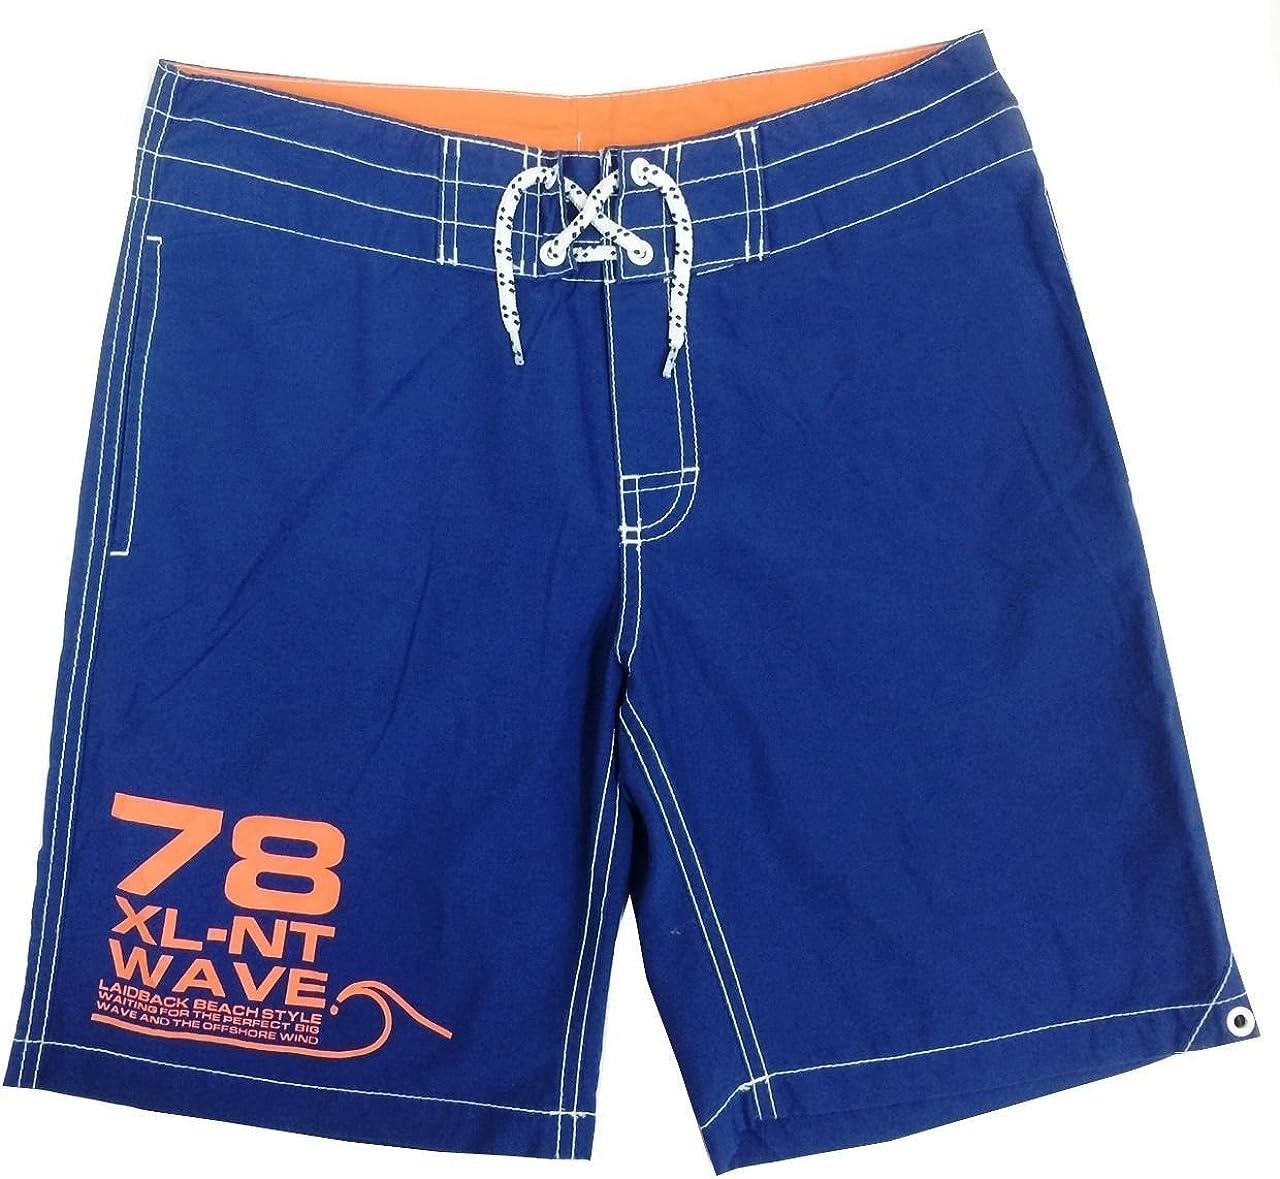 Integriti Schoolwear Boys Kids EX H/&M Blue /& Orange Drawstring Swim Shorts Beach Surf 2-14 Years